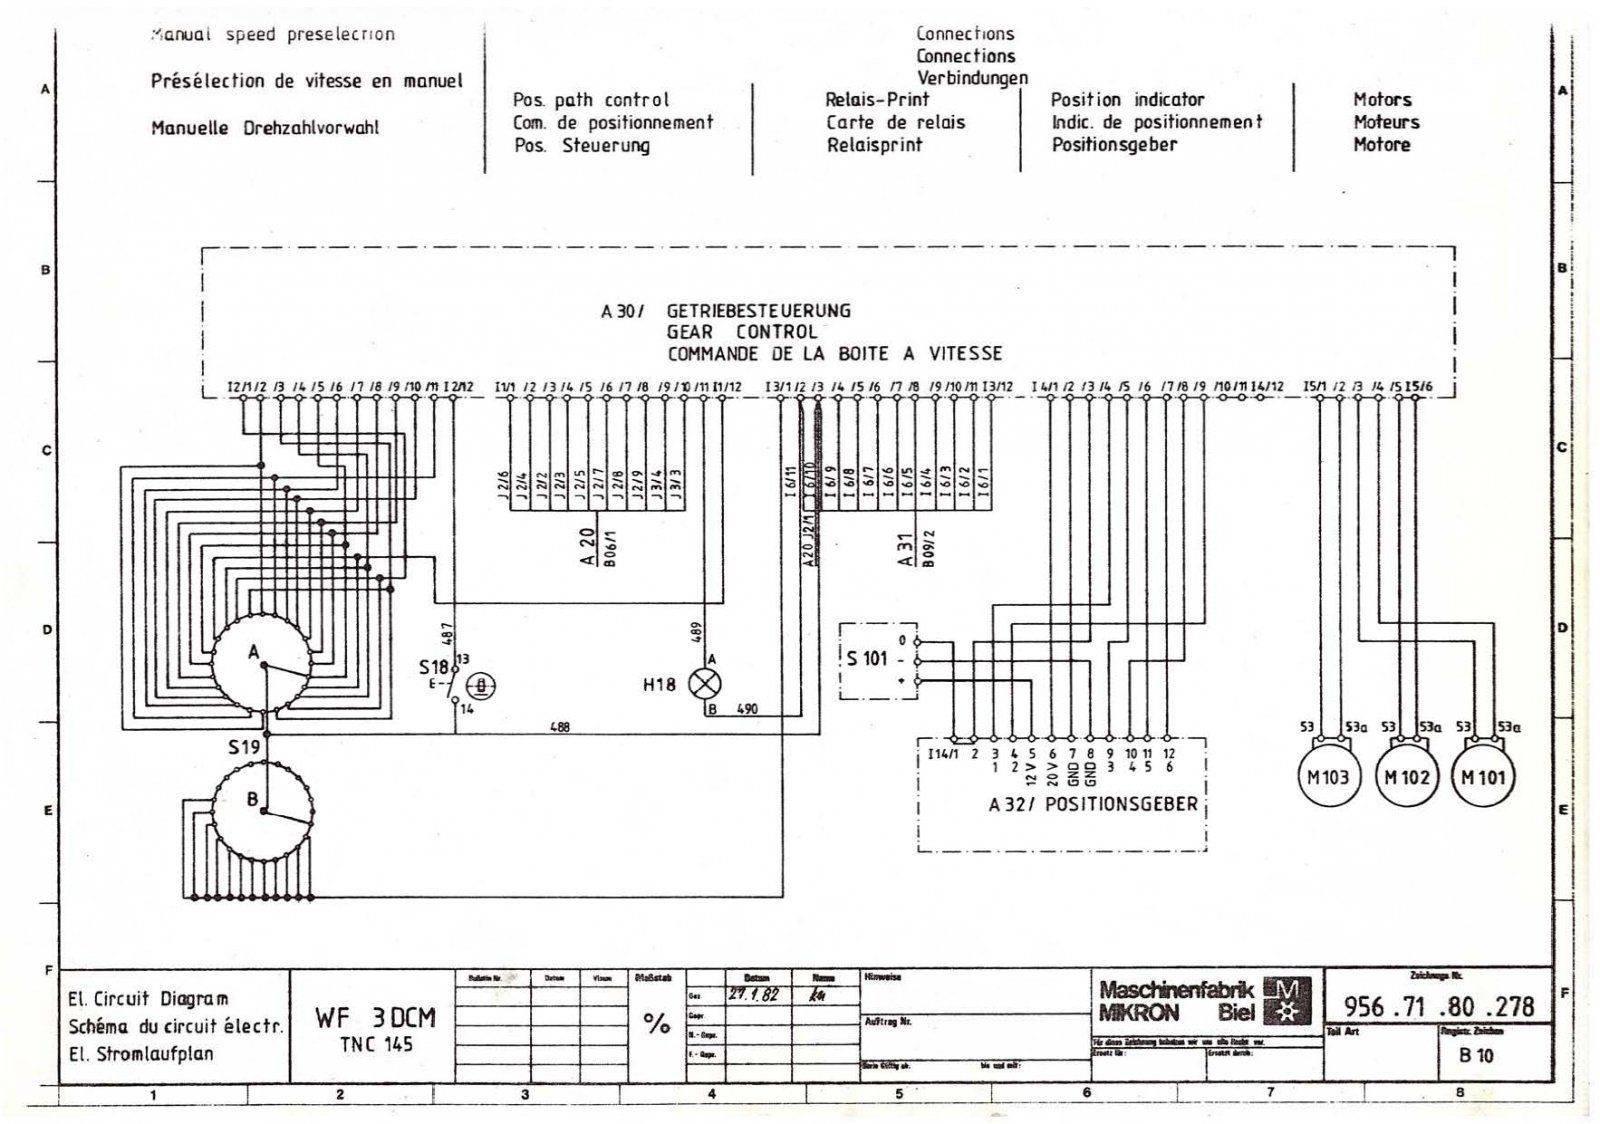 Mikron WF 2-3 DCM elec_Page_18.jpg